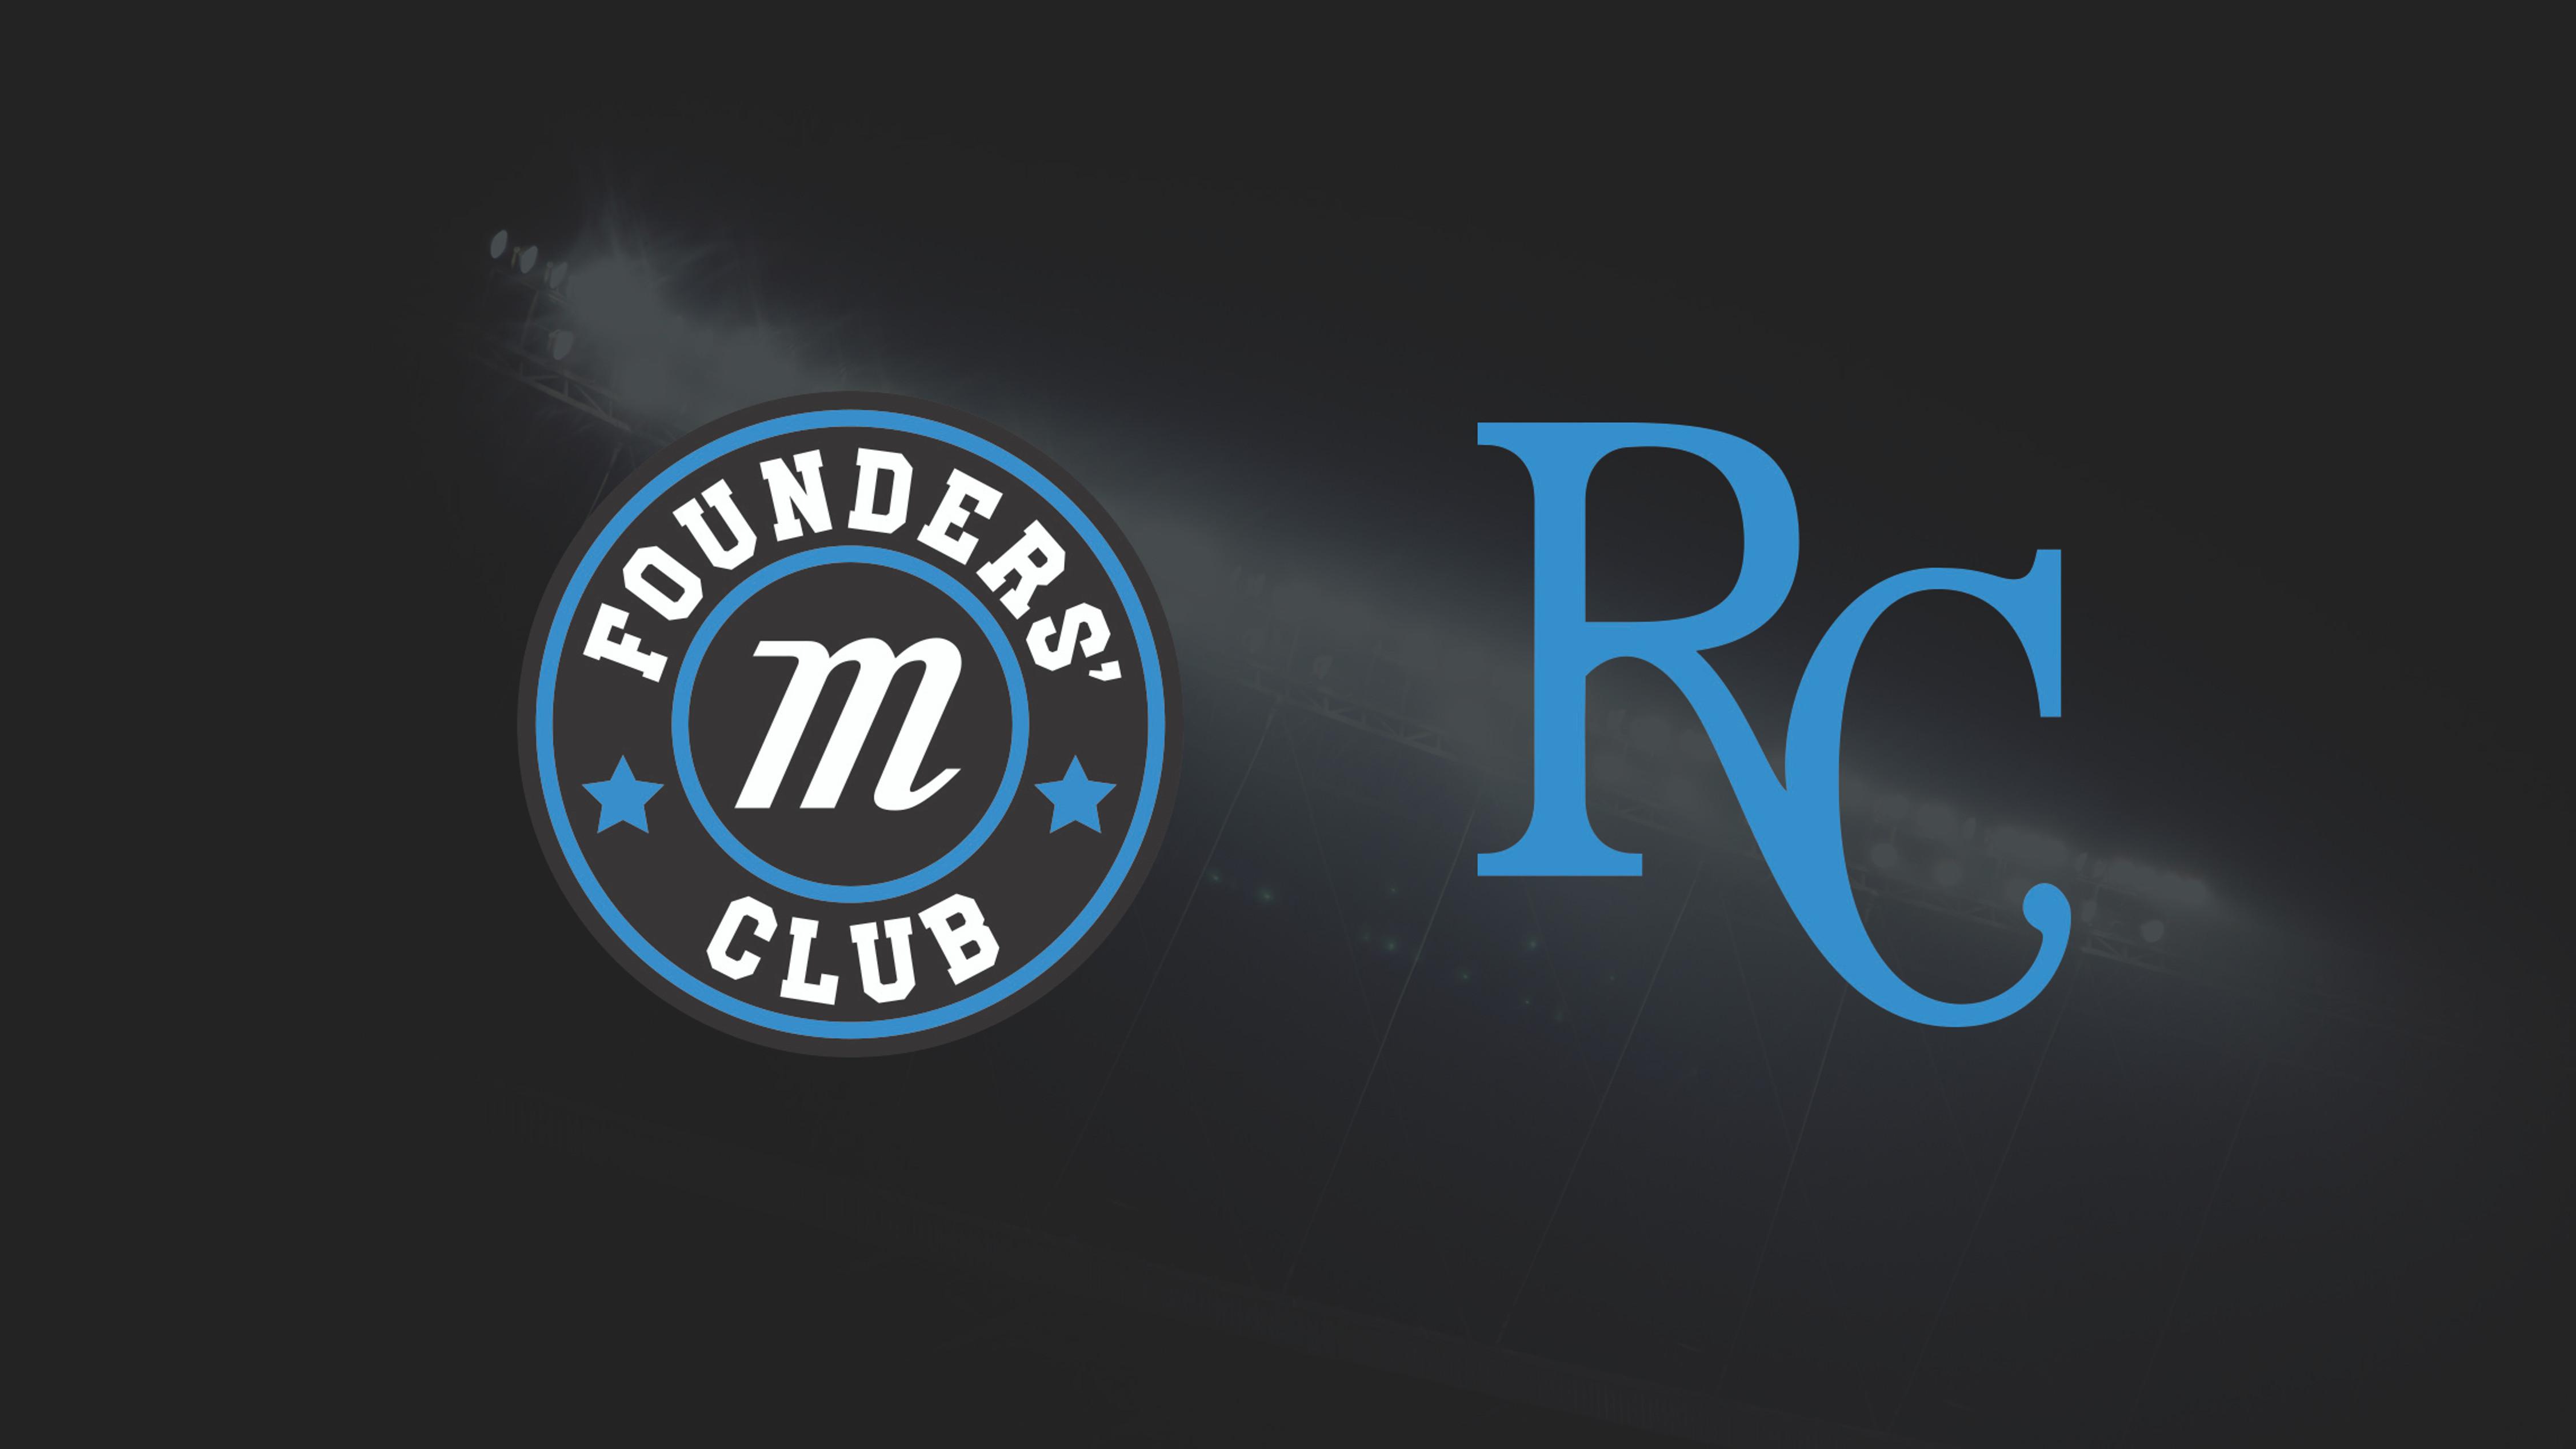 RICHMOND COUNTY BASEBALL CLUB CONTINUES WITH MARUCCI FOUNDERS' CLUB